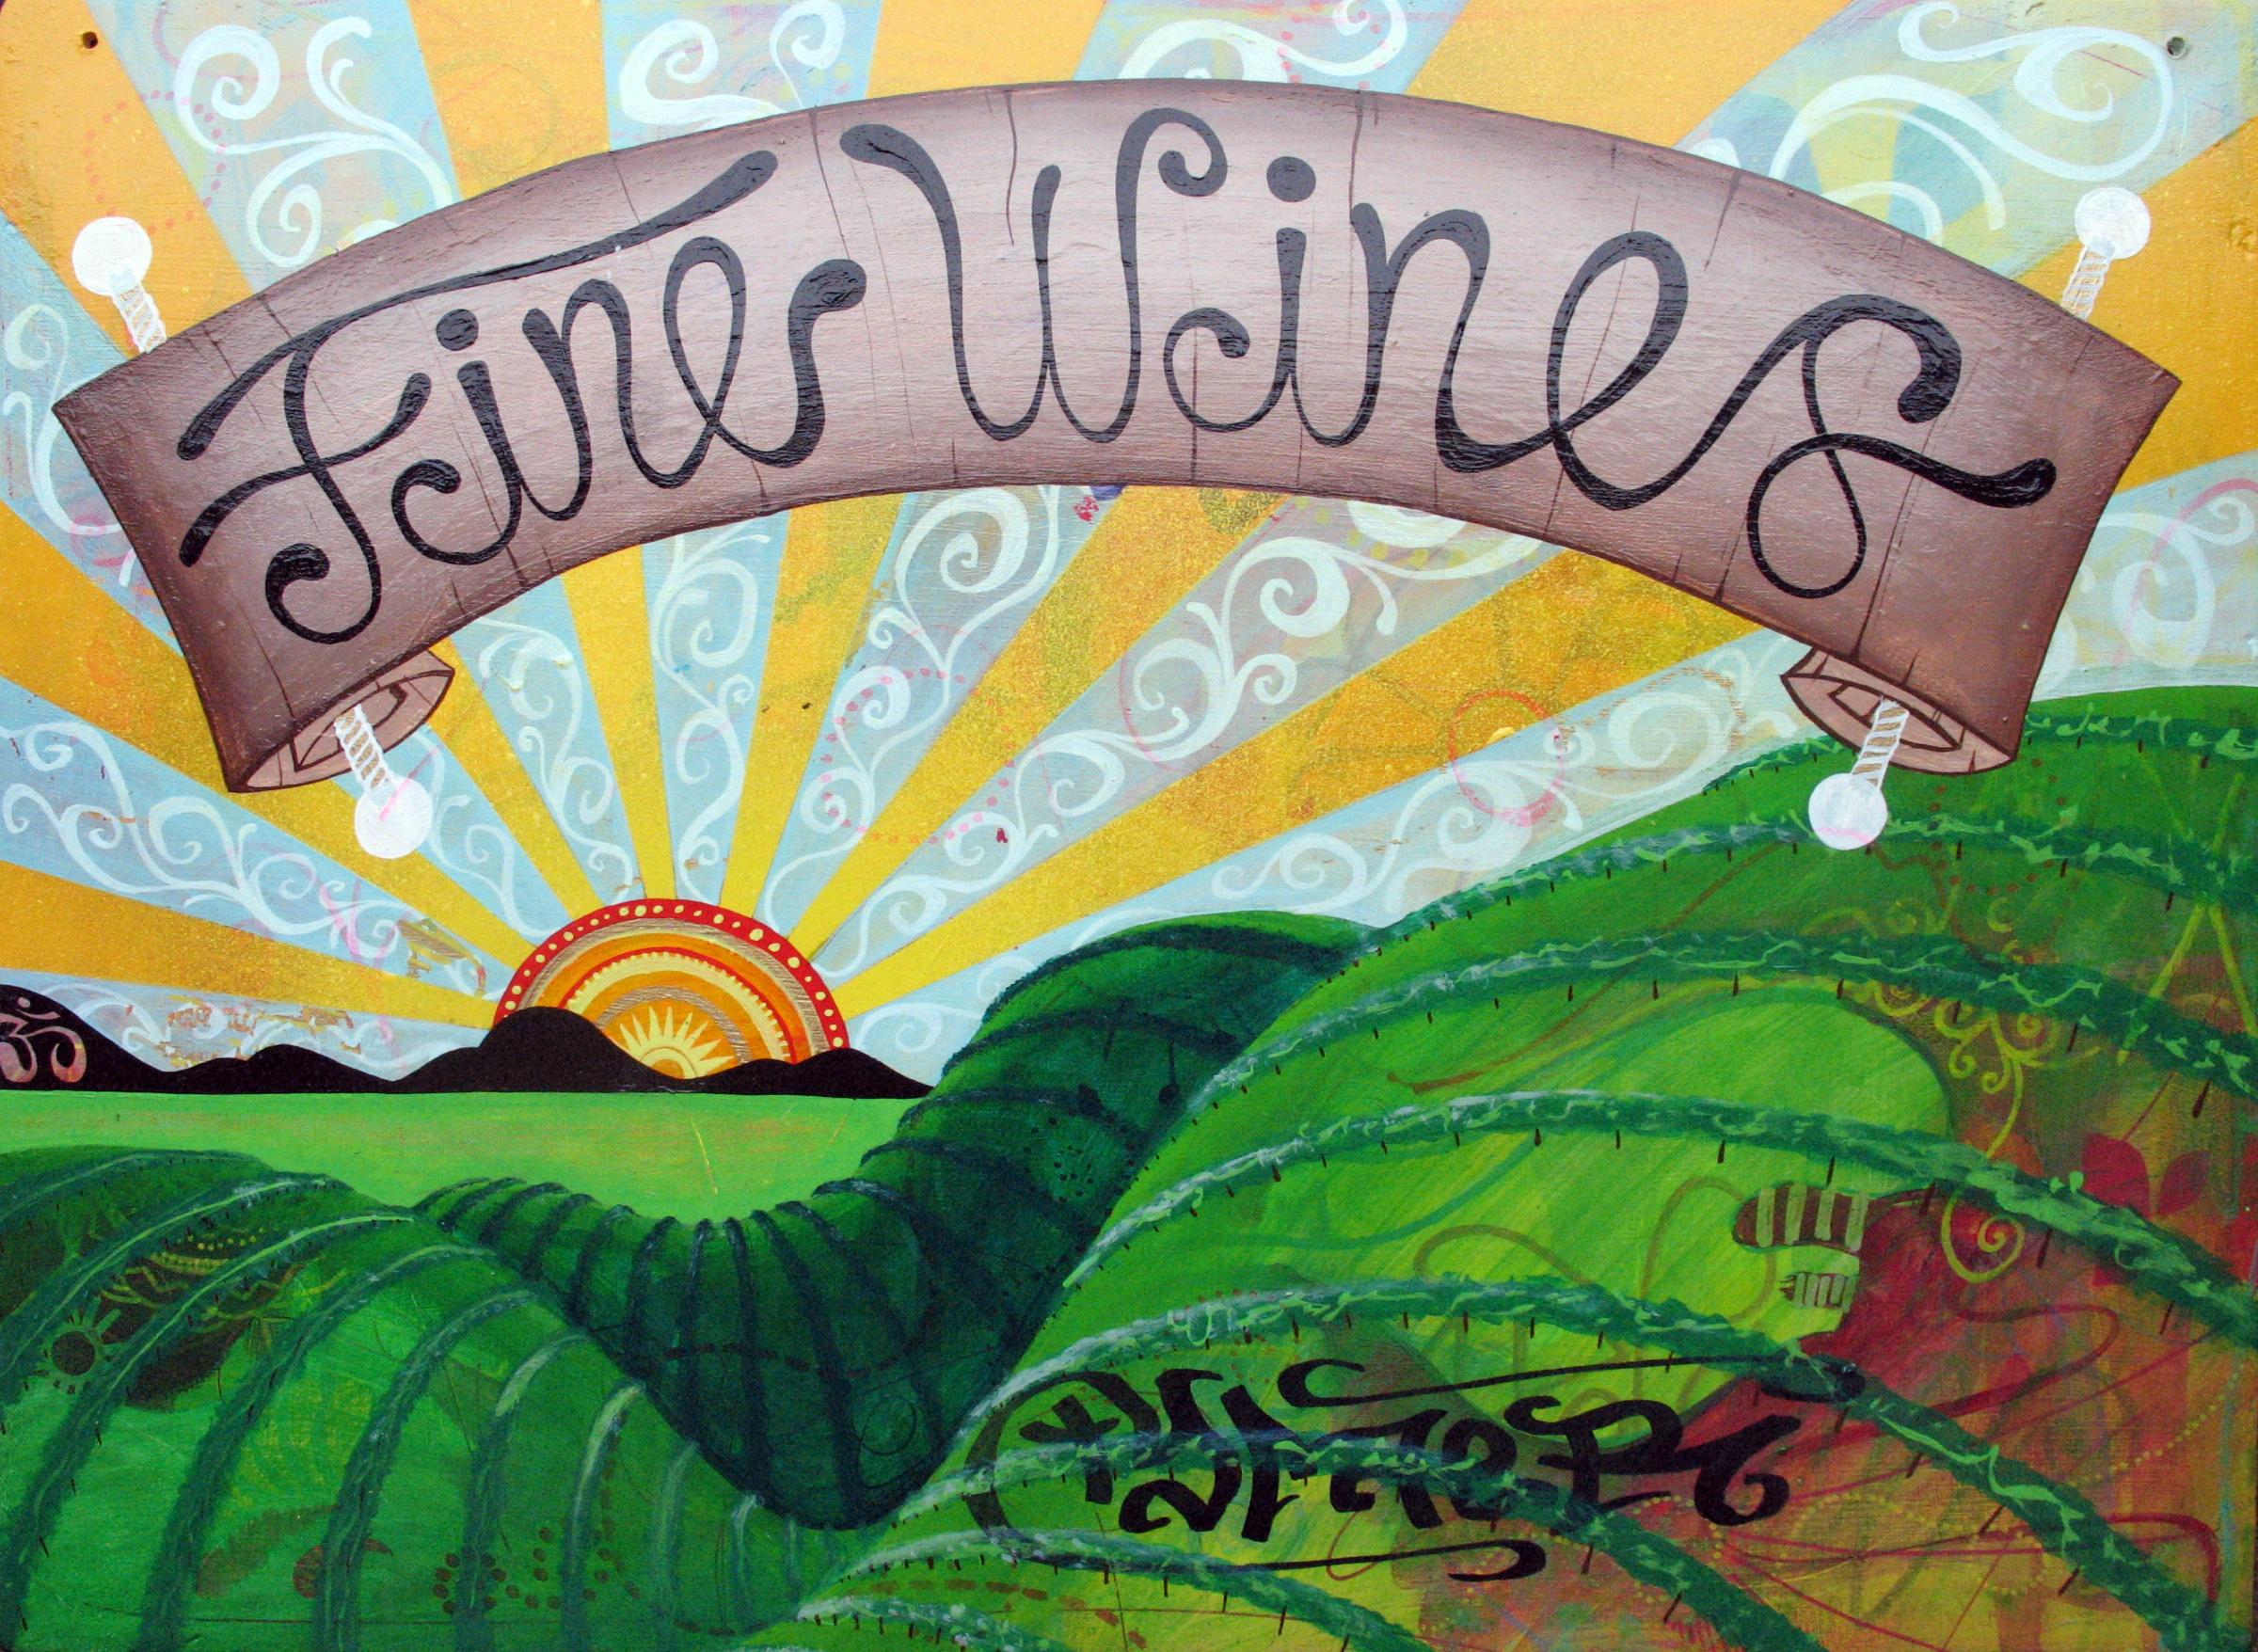 Sign_fine wines dean.jpg